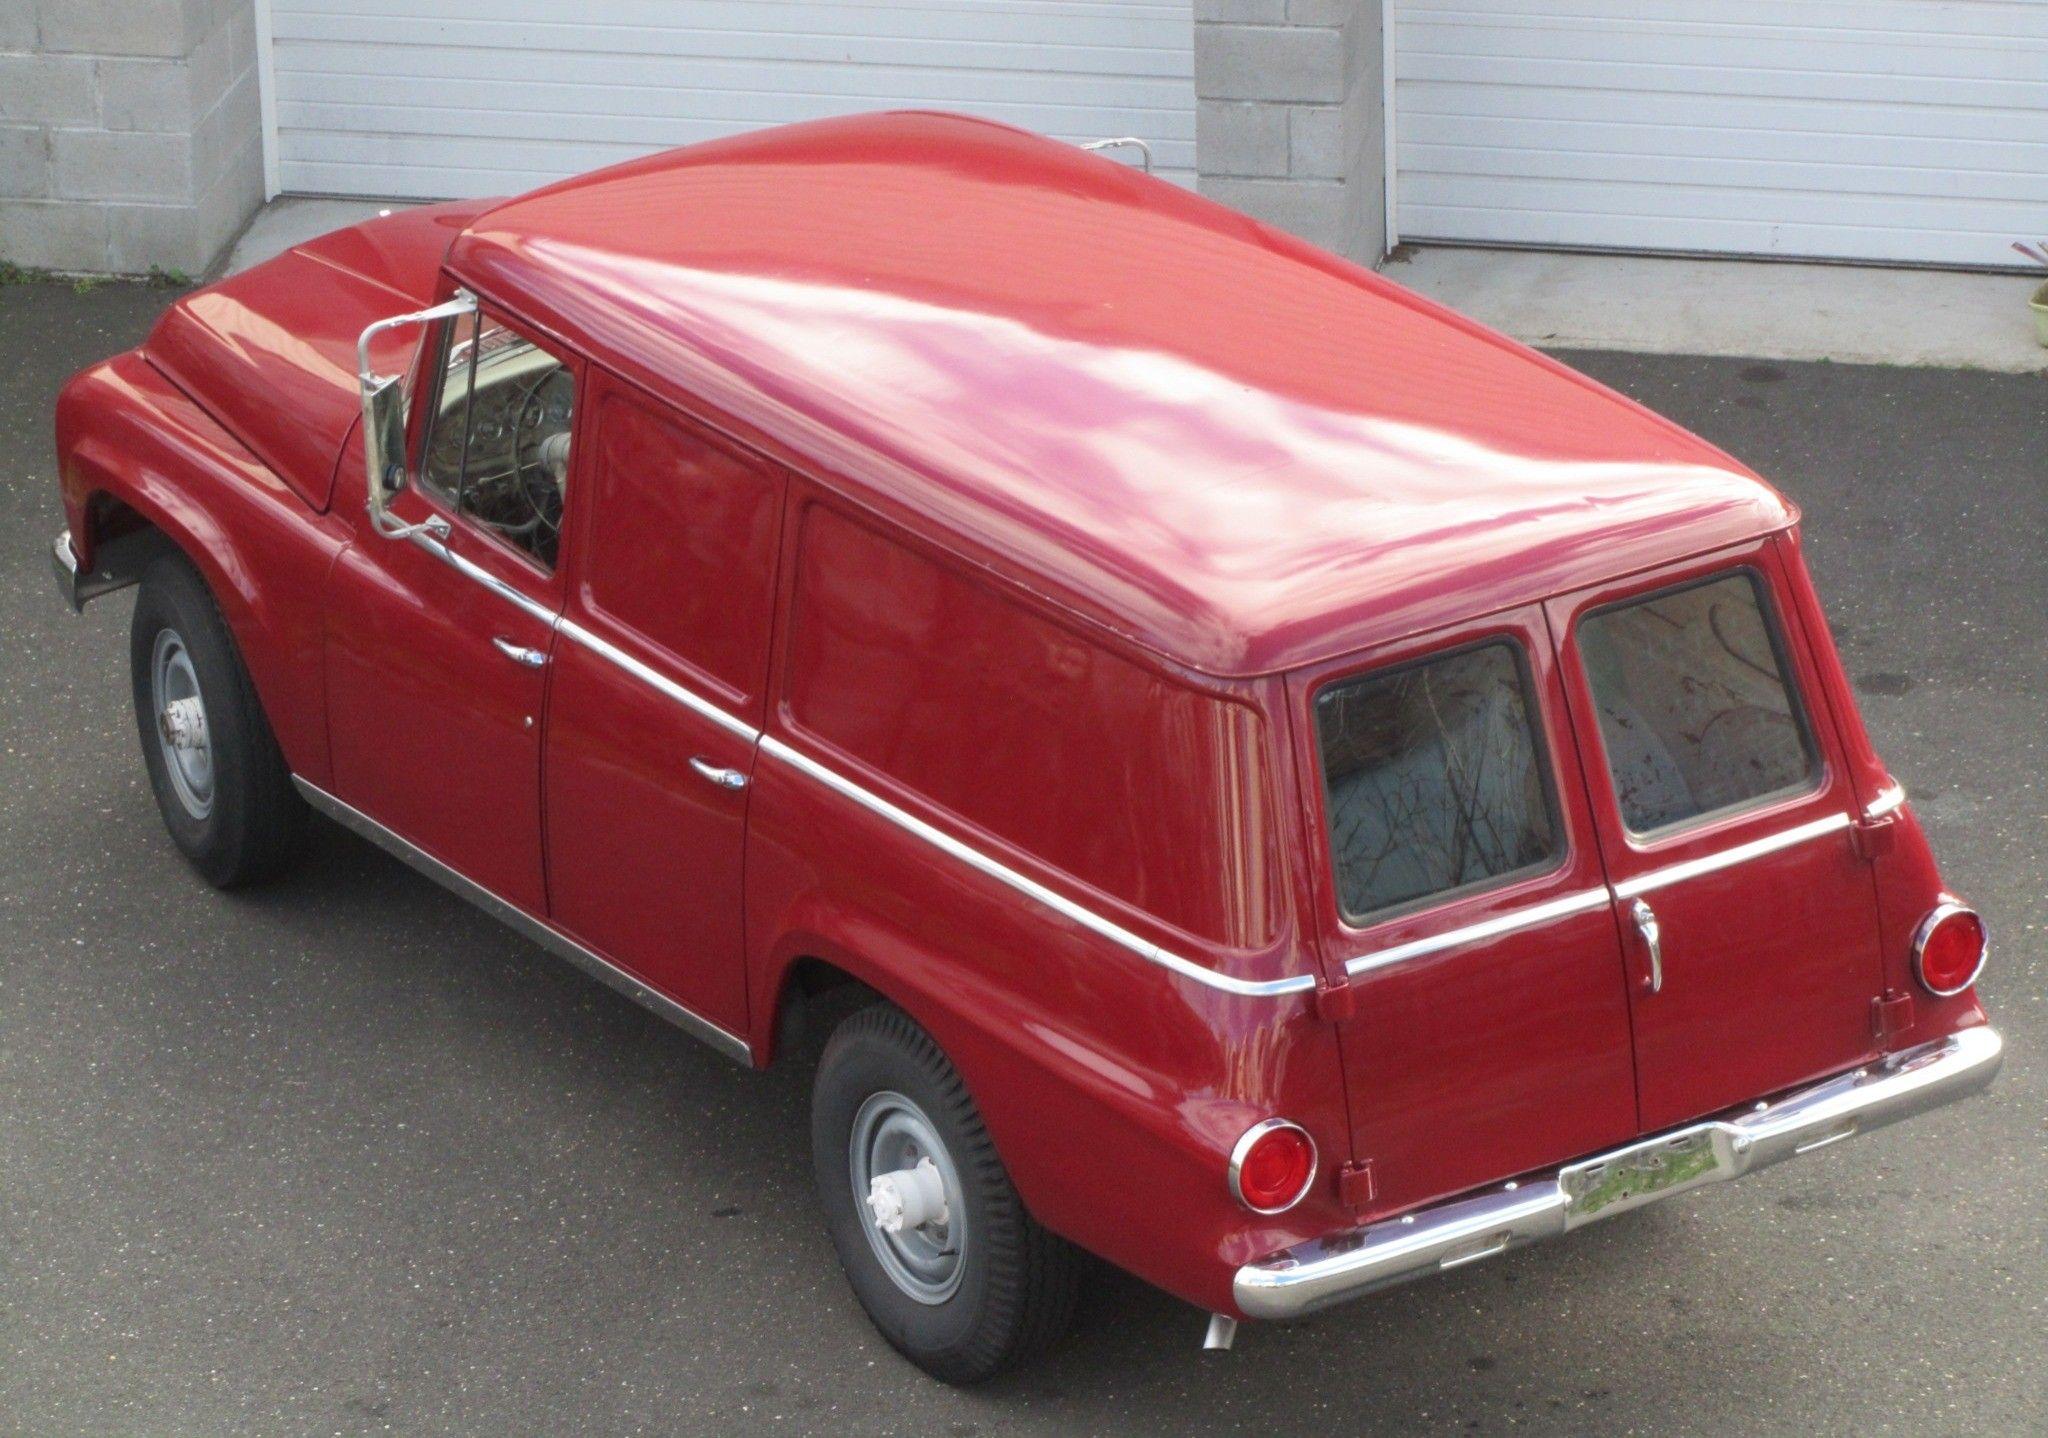 1967 International Travelall Panel Van W 292ci Small Block V8 International Travelall Van Trucks